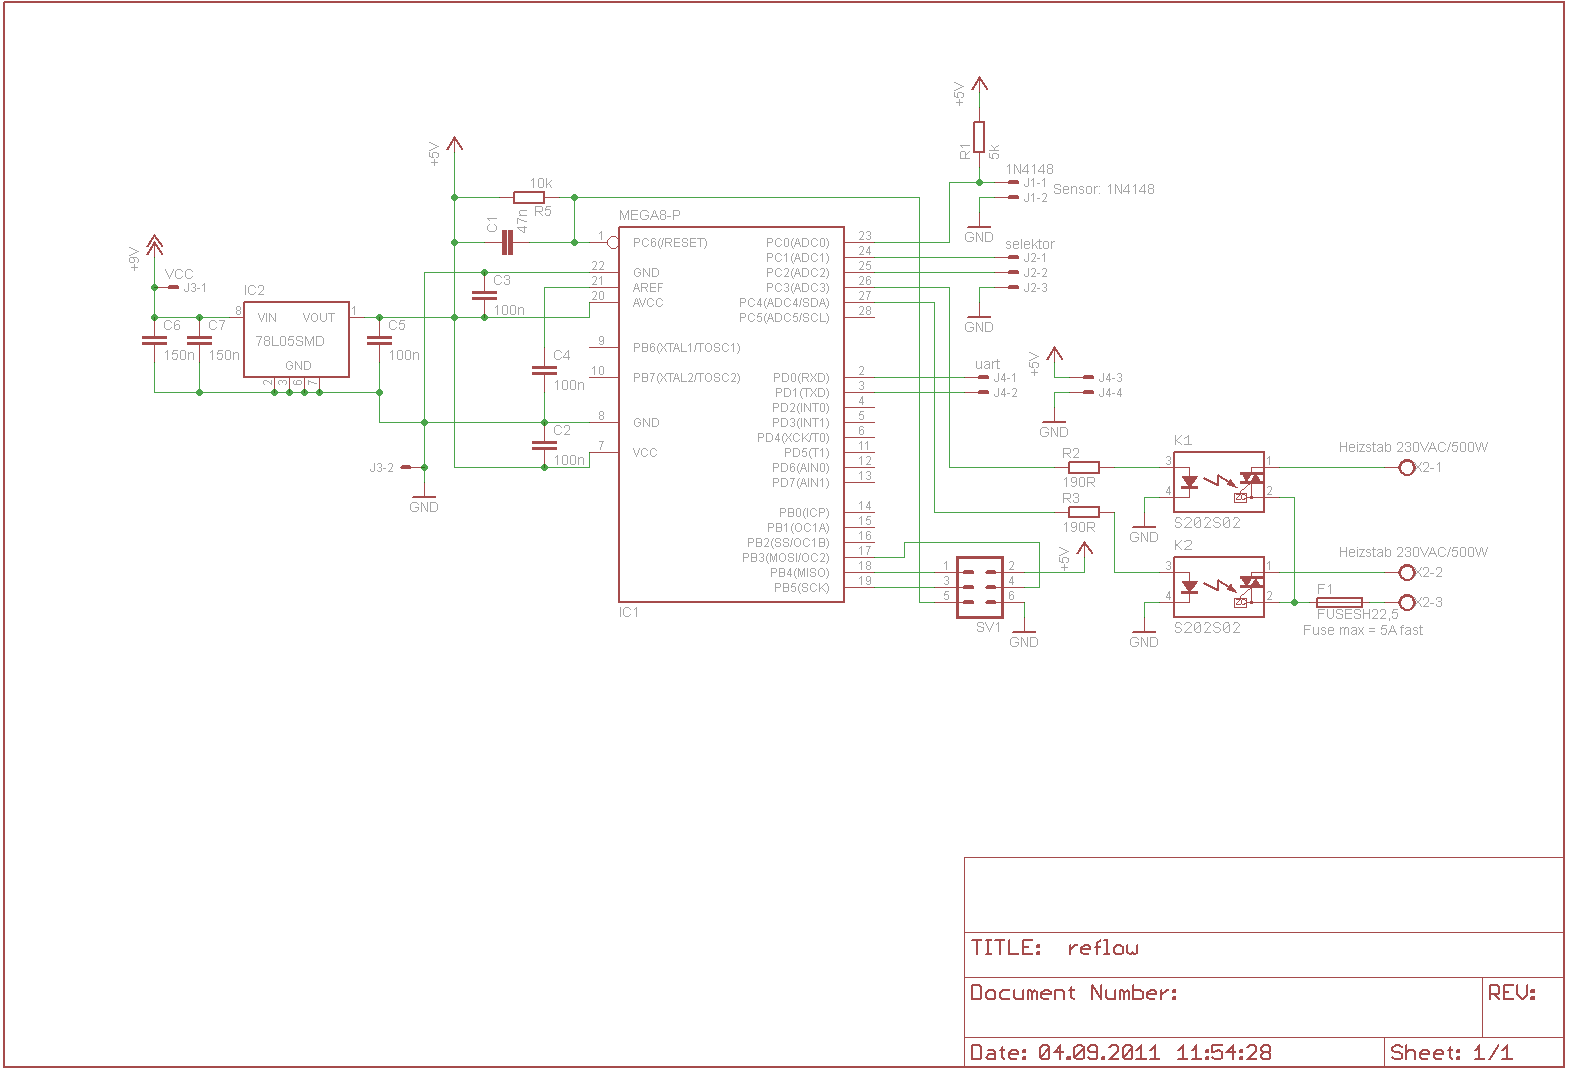 Schaltplan Review: Reflowofen - Mikrocontroller.net